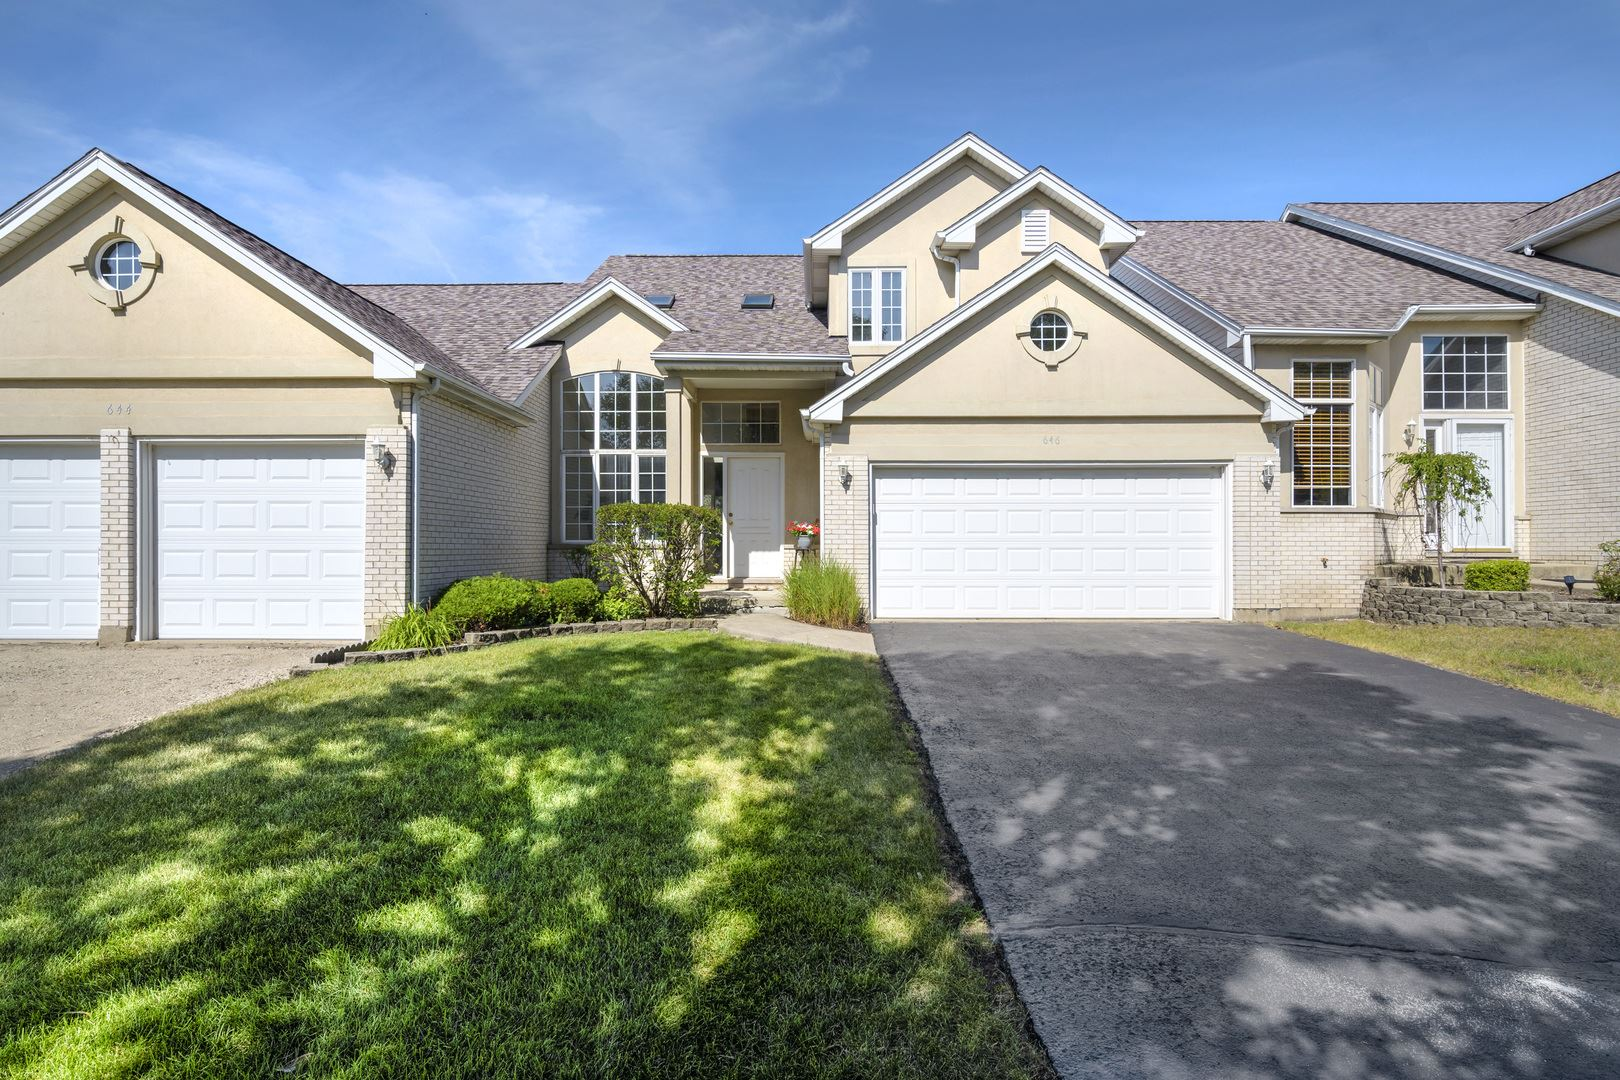 Photo of 646 Aspen Drive, Romeoville, IL 60446 (MLS # 10808741)